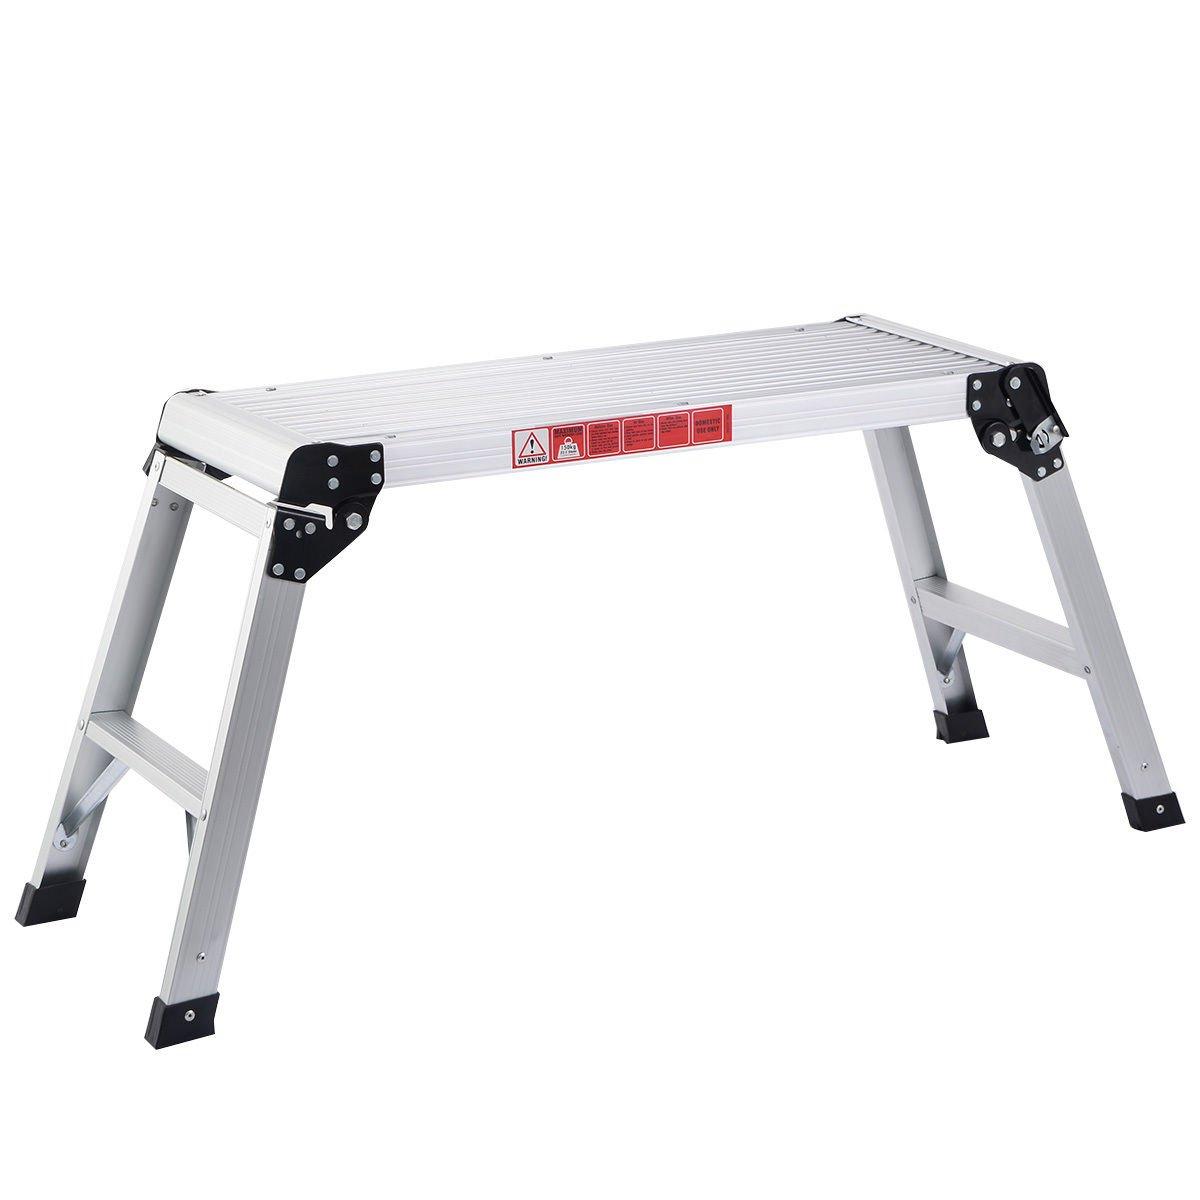 Giantex Hd En131 Aluminum Platform Drywall Step up Folding Work Bench Stool Ladder